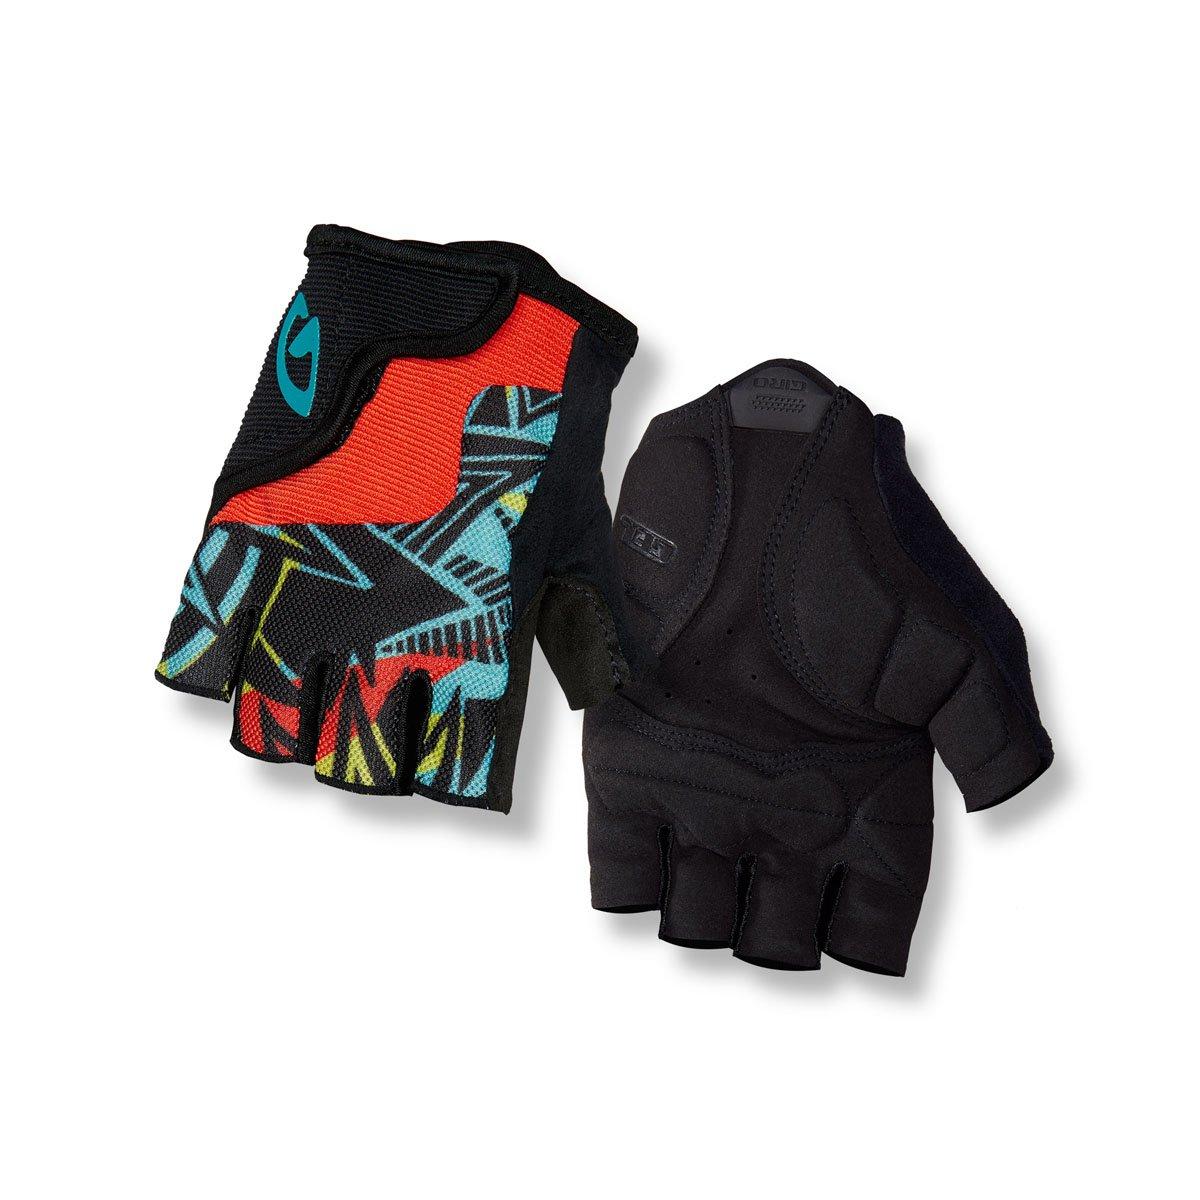 Size L Giro Bravo Junior Childrens Cycling Gloves Short Black//blue//red 2018